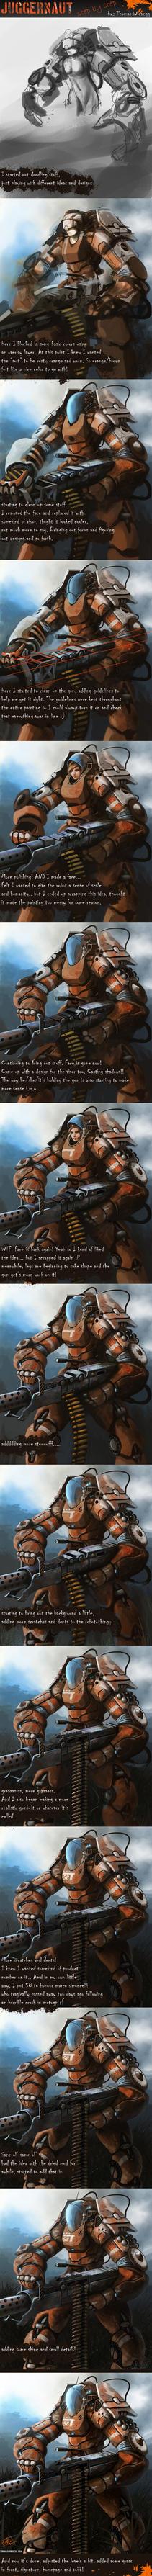 Juggernaut Step by step by thomaswievegg